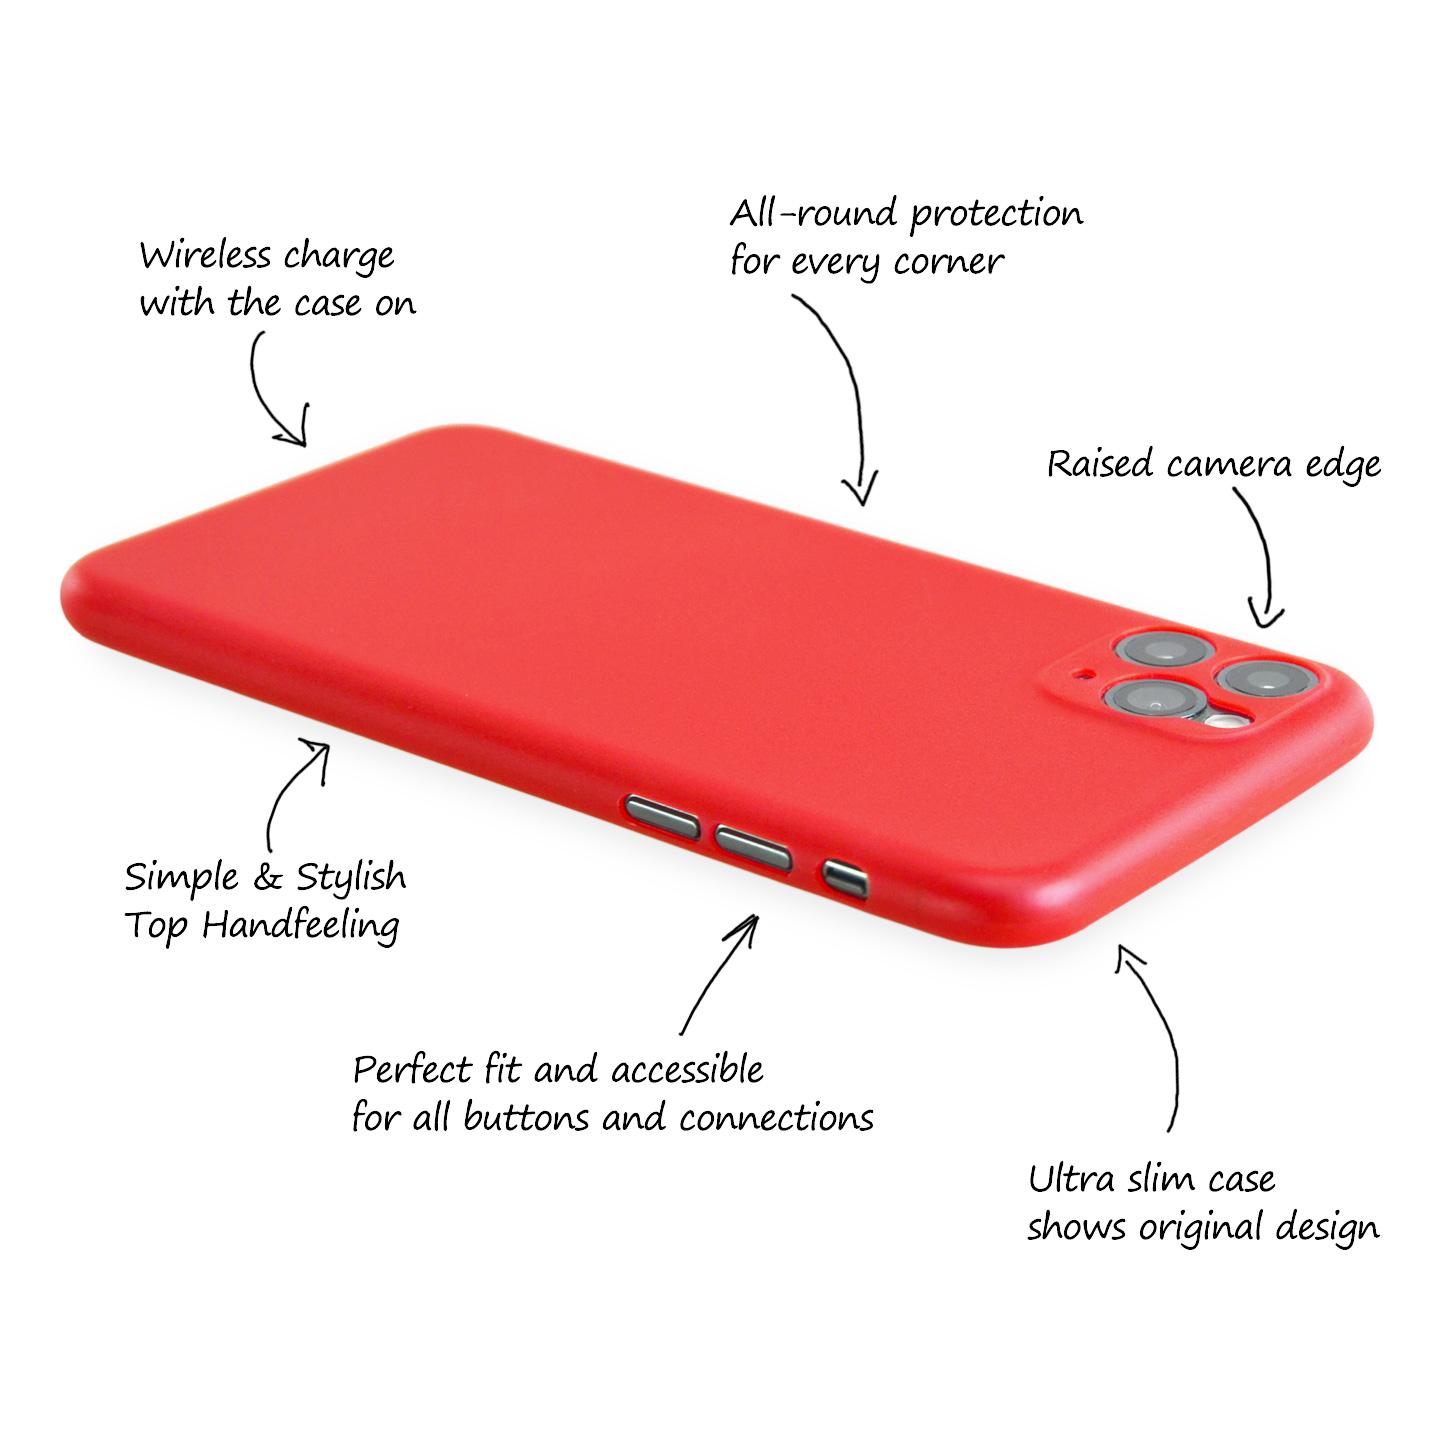 Ultra-Slim-Case-iPhone-11-Pro-5-8-034-Matt-Clear-Schutz-Huelle-Skin-Cover-Etui-Folie Indexbild 46